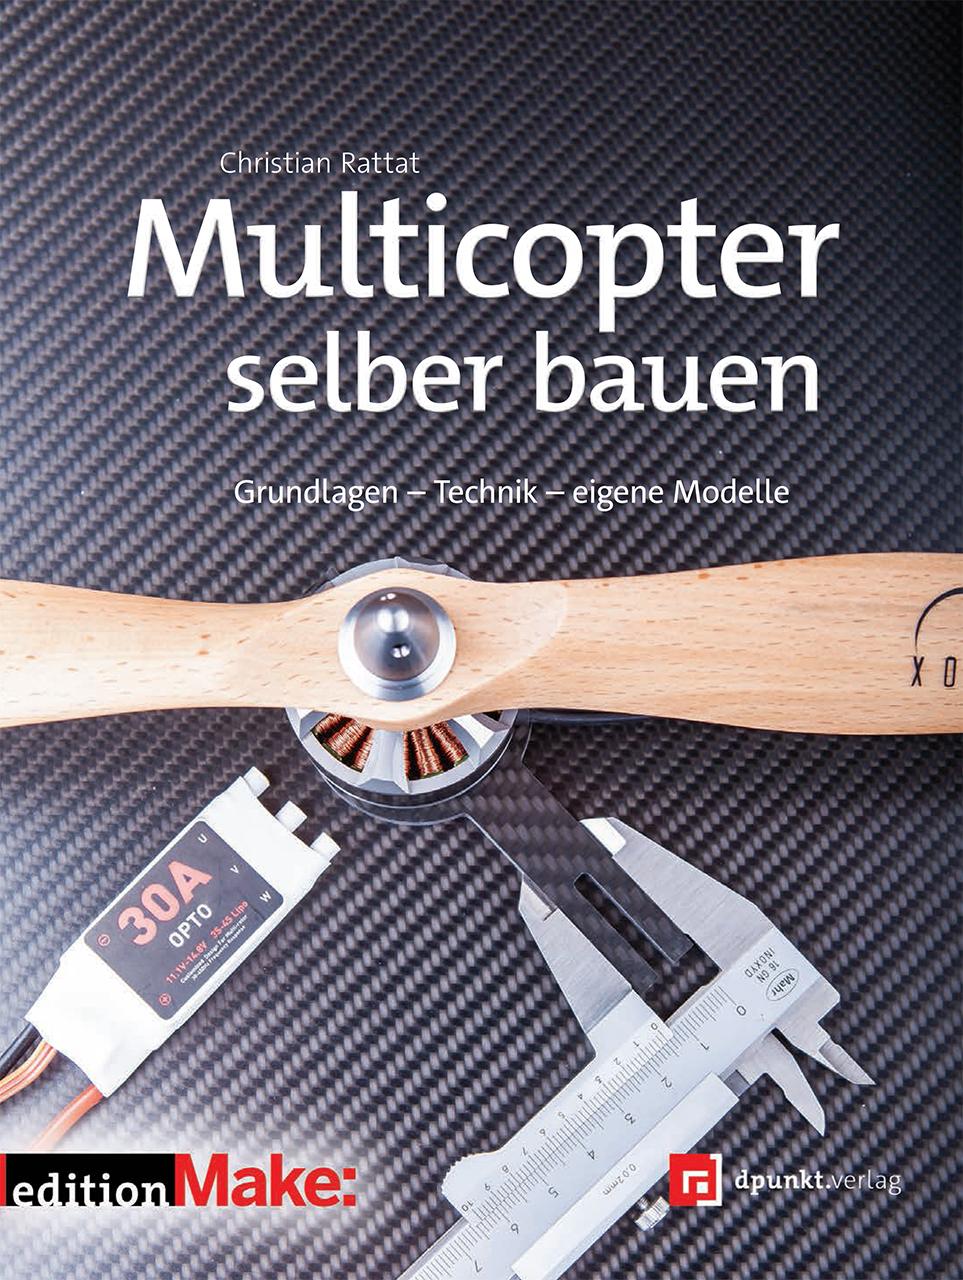 Multicopter selber bauen: Grundlagen - Technik - eigene Modelle - Christian Rattat [Broschiert]